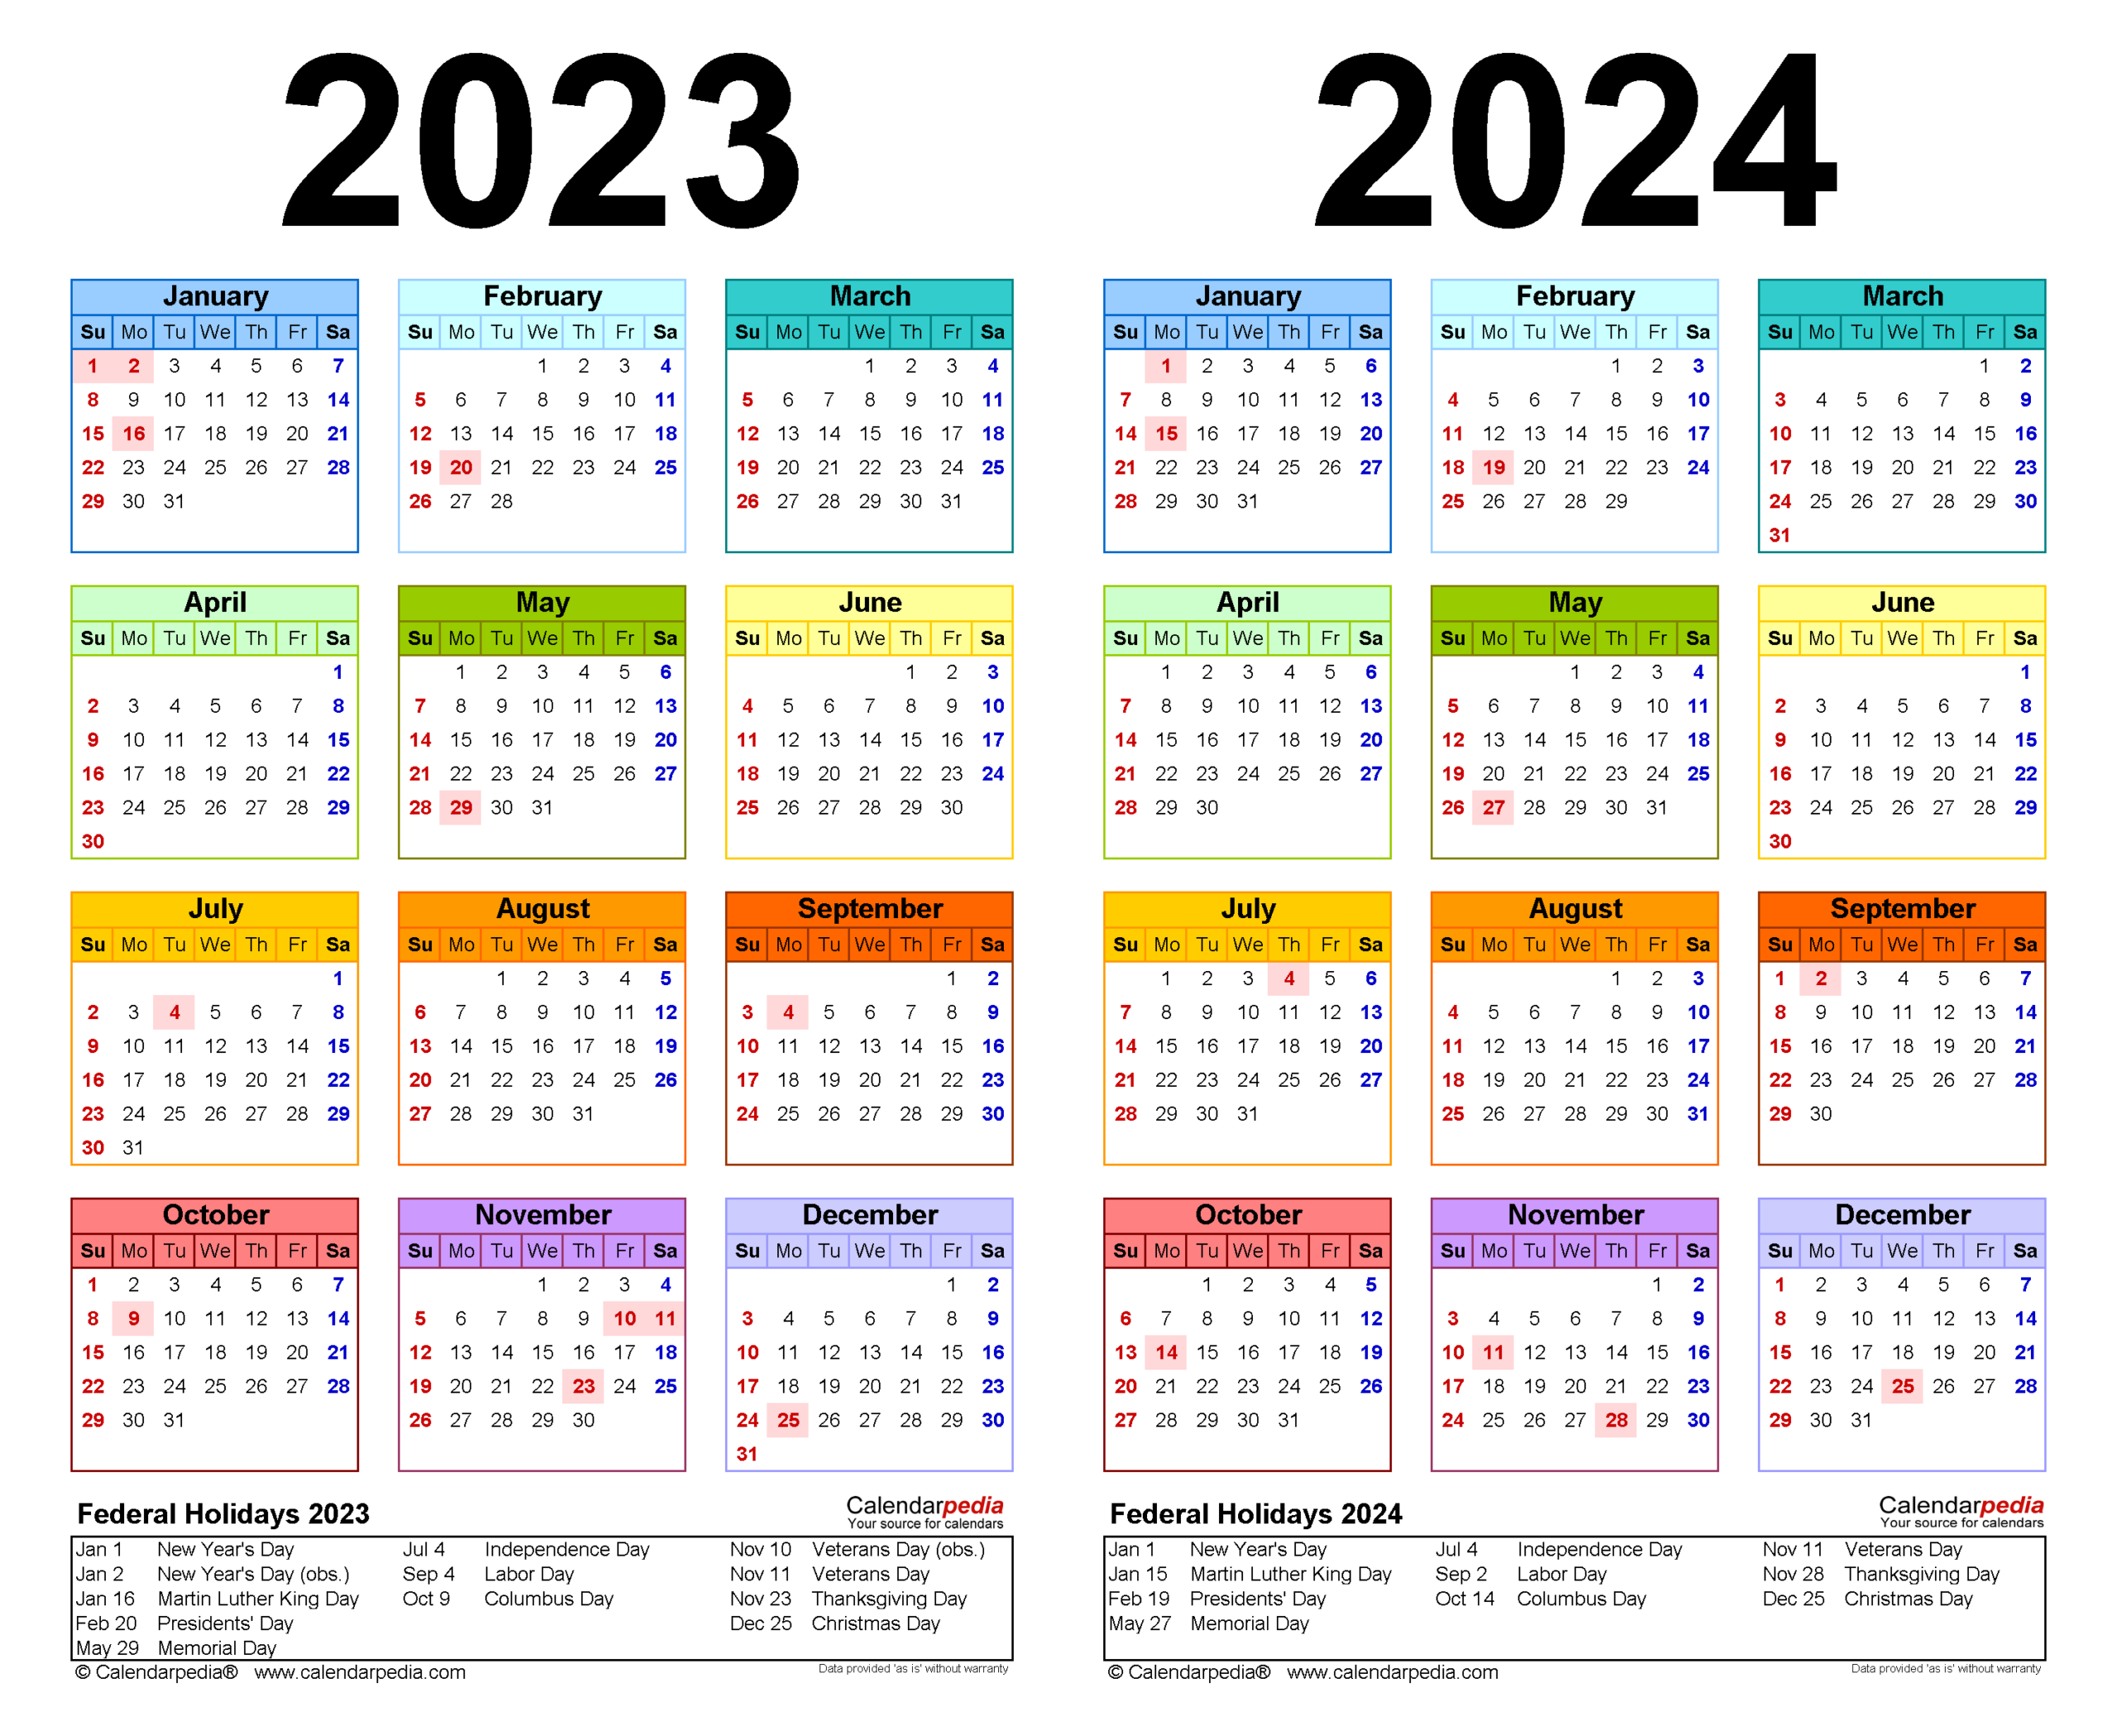 2023-2024 Two Year Calendar - Free Printable Microsoft for 2022 2023 School Calendar North Penn